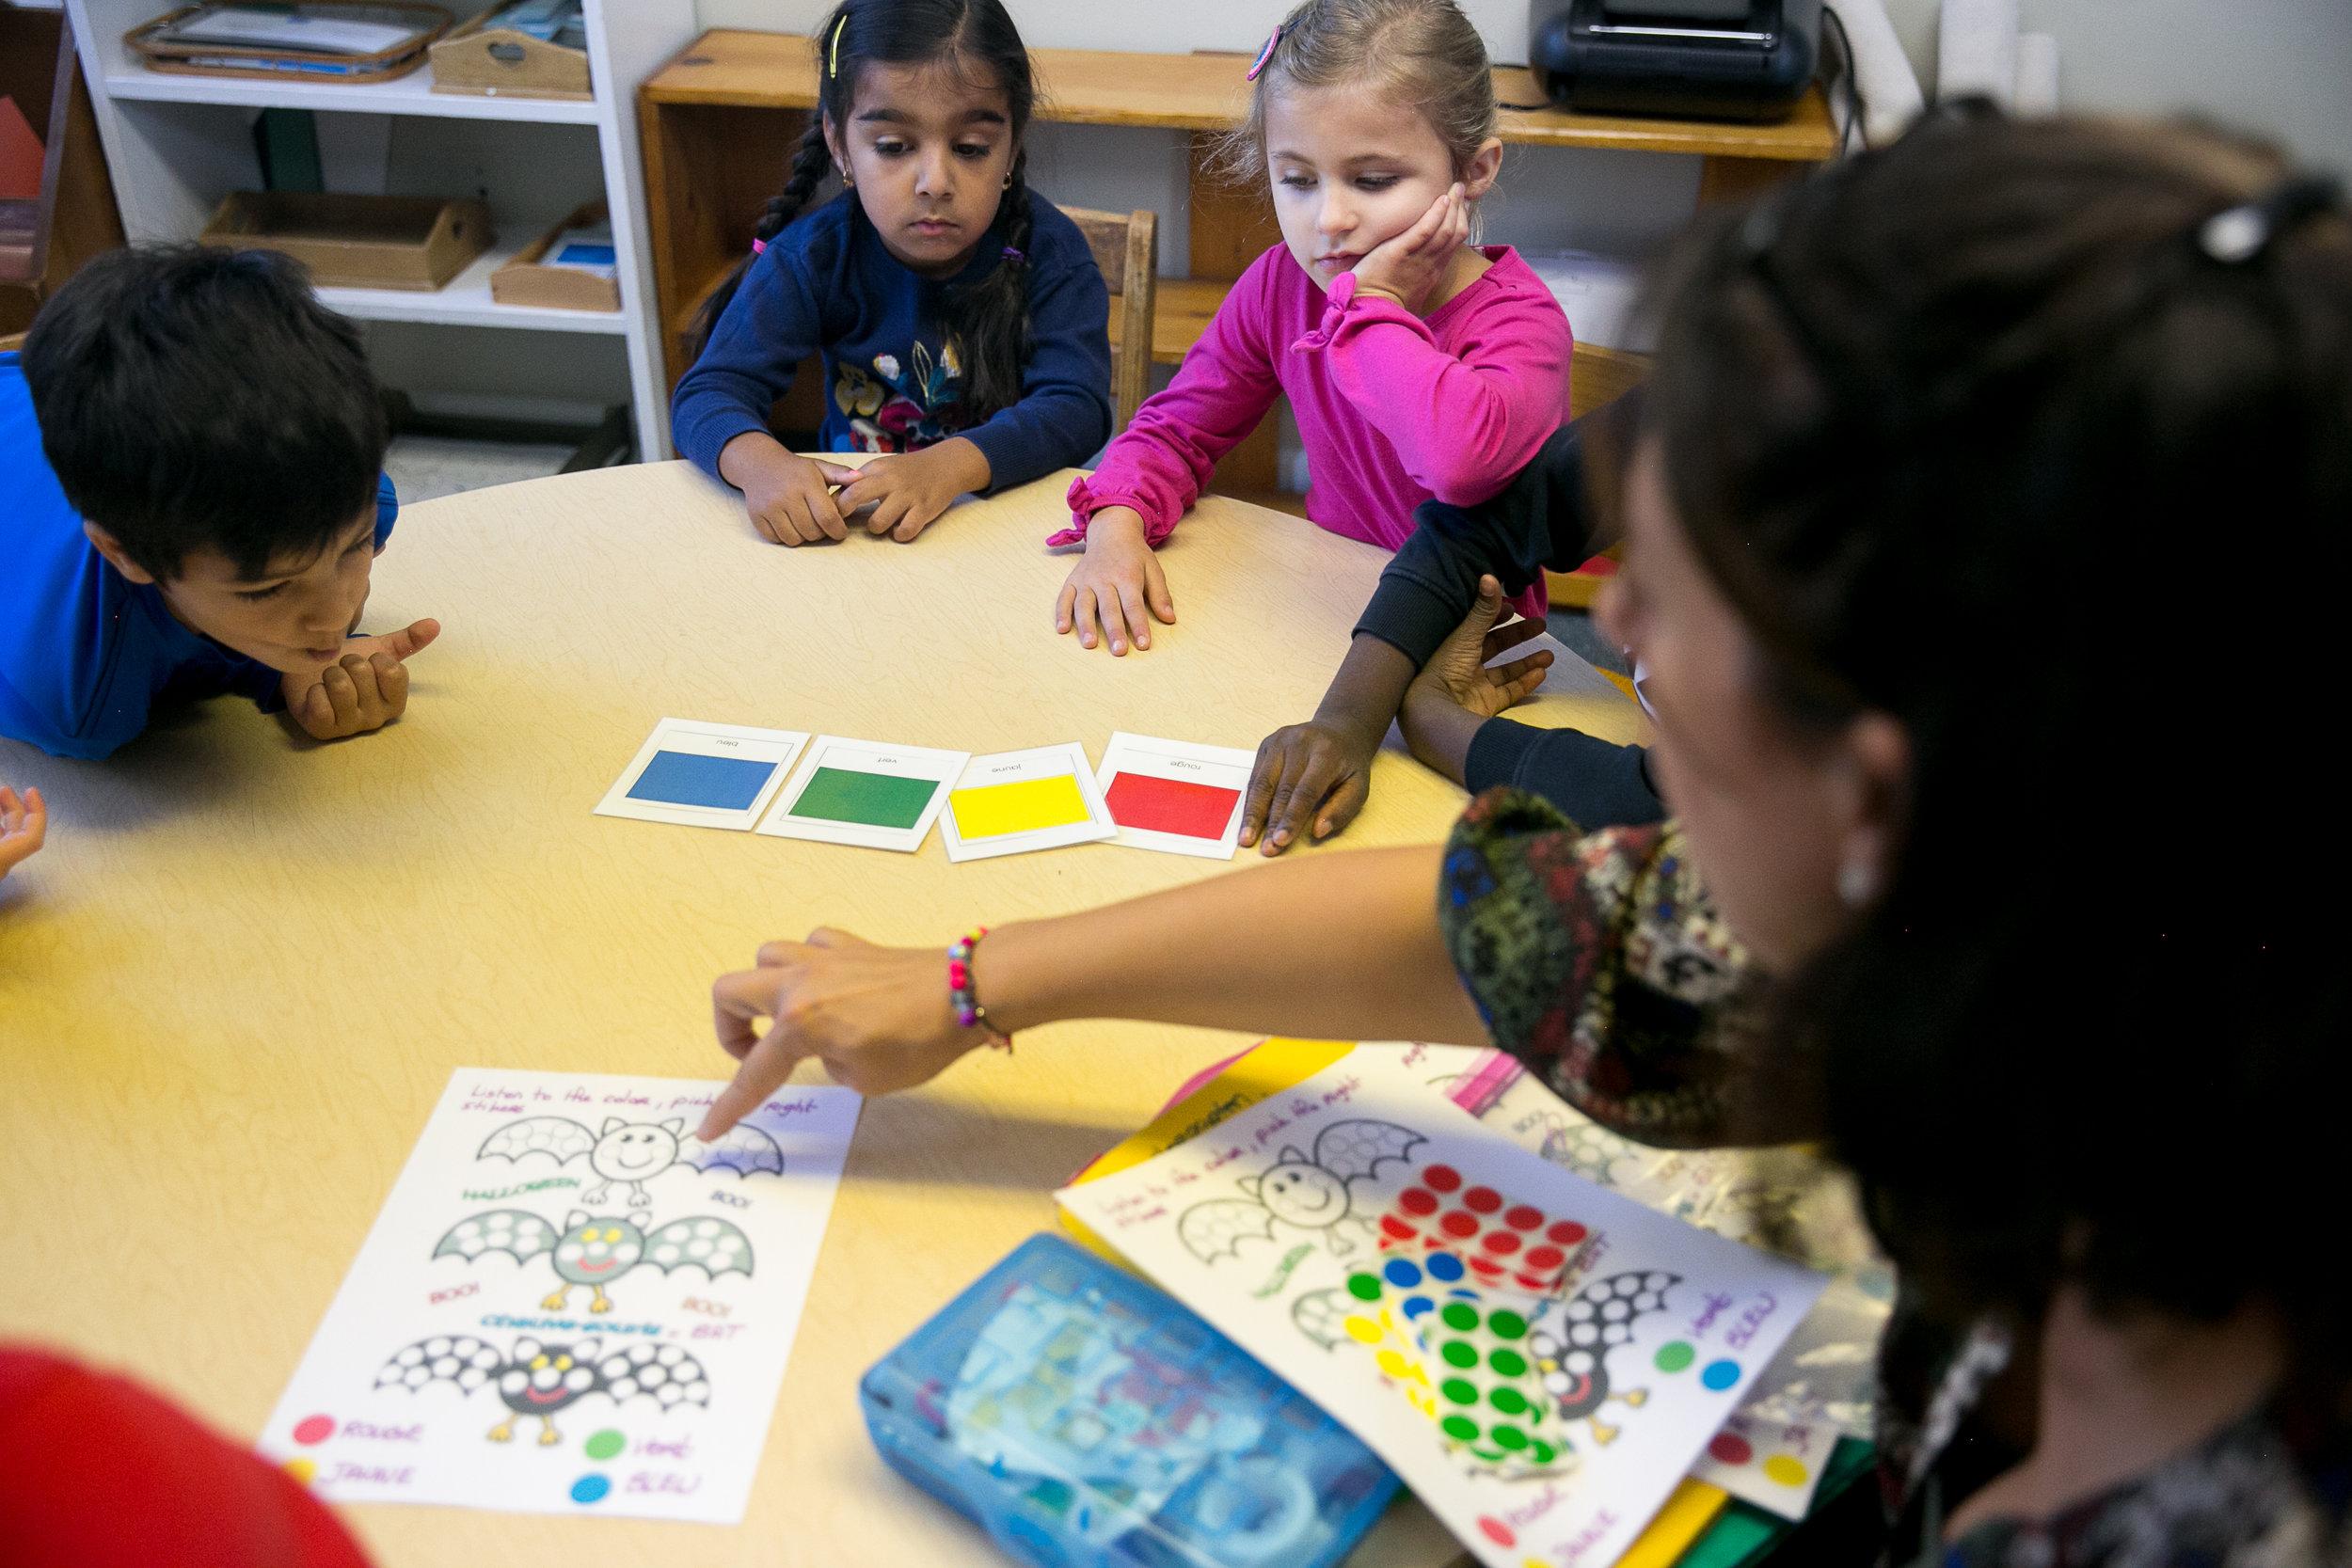 Rosehill_Montessori_Preschool_Kindergarten_classroom_reading_math_science_writing_learning_curriculum_French_Enrichment.jpg